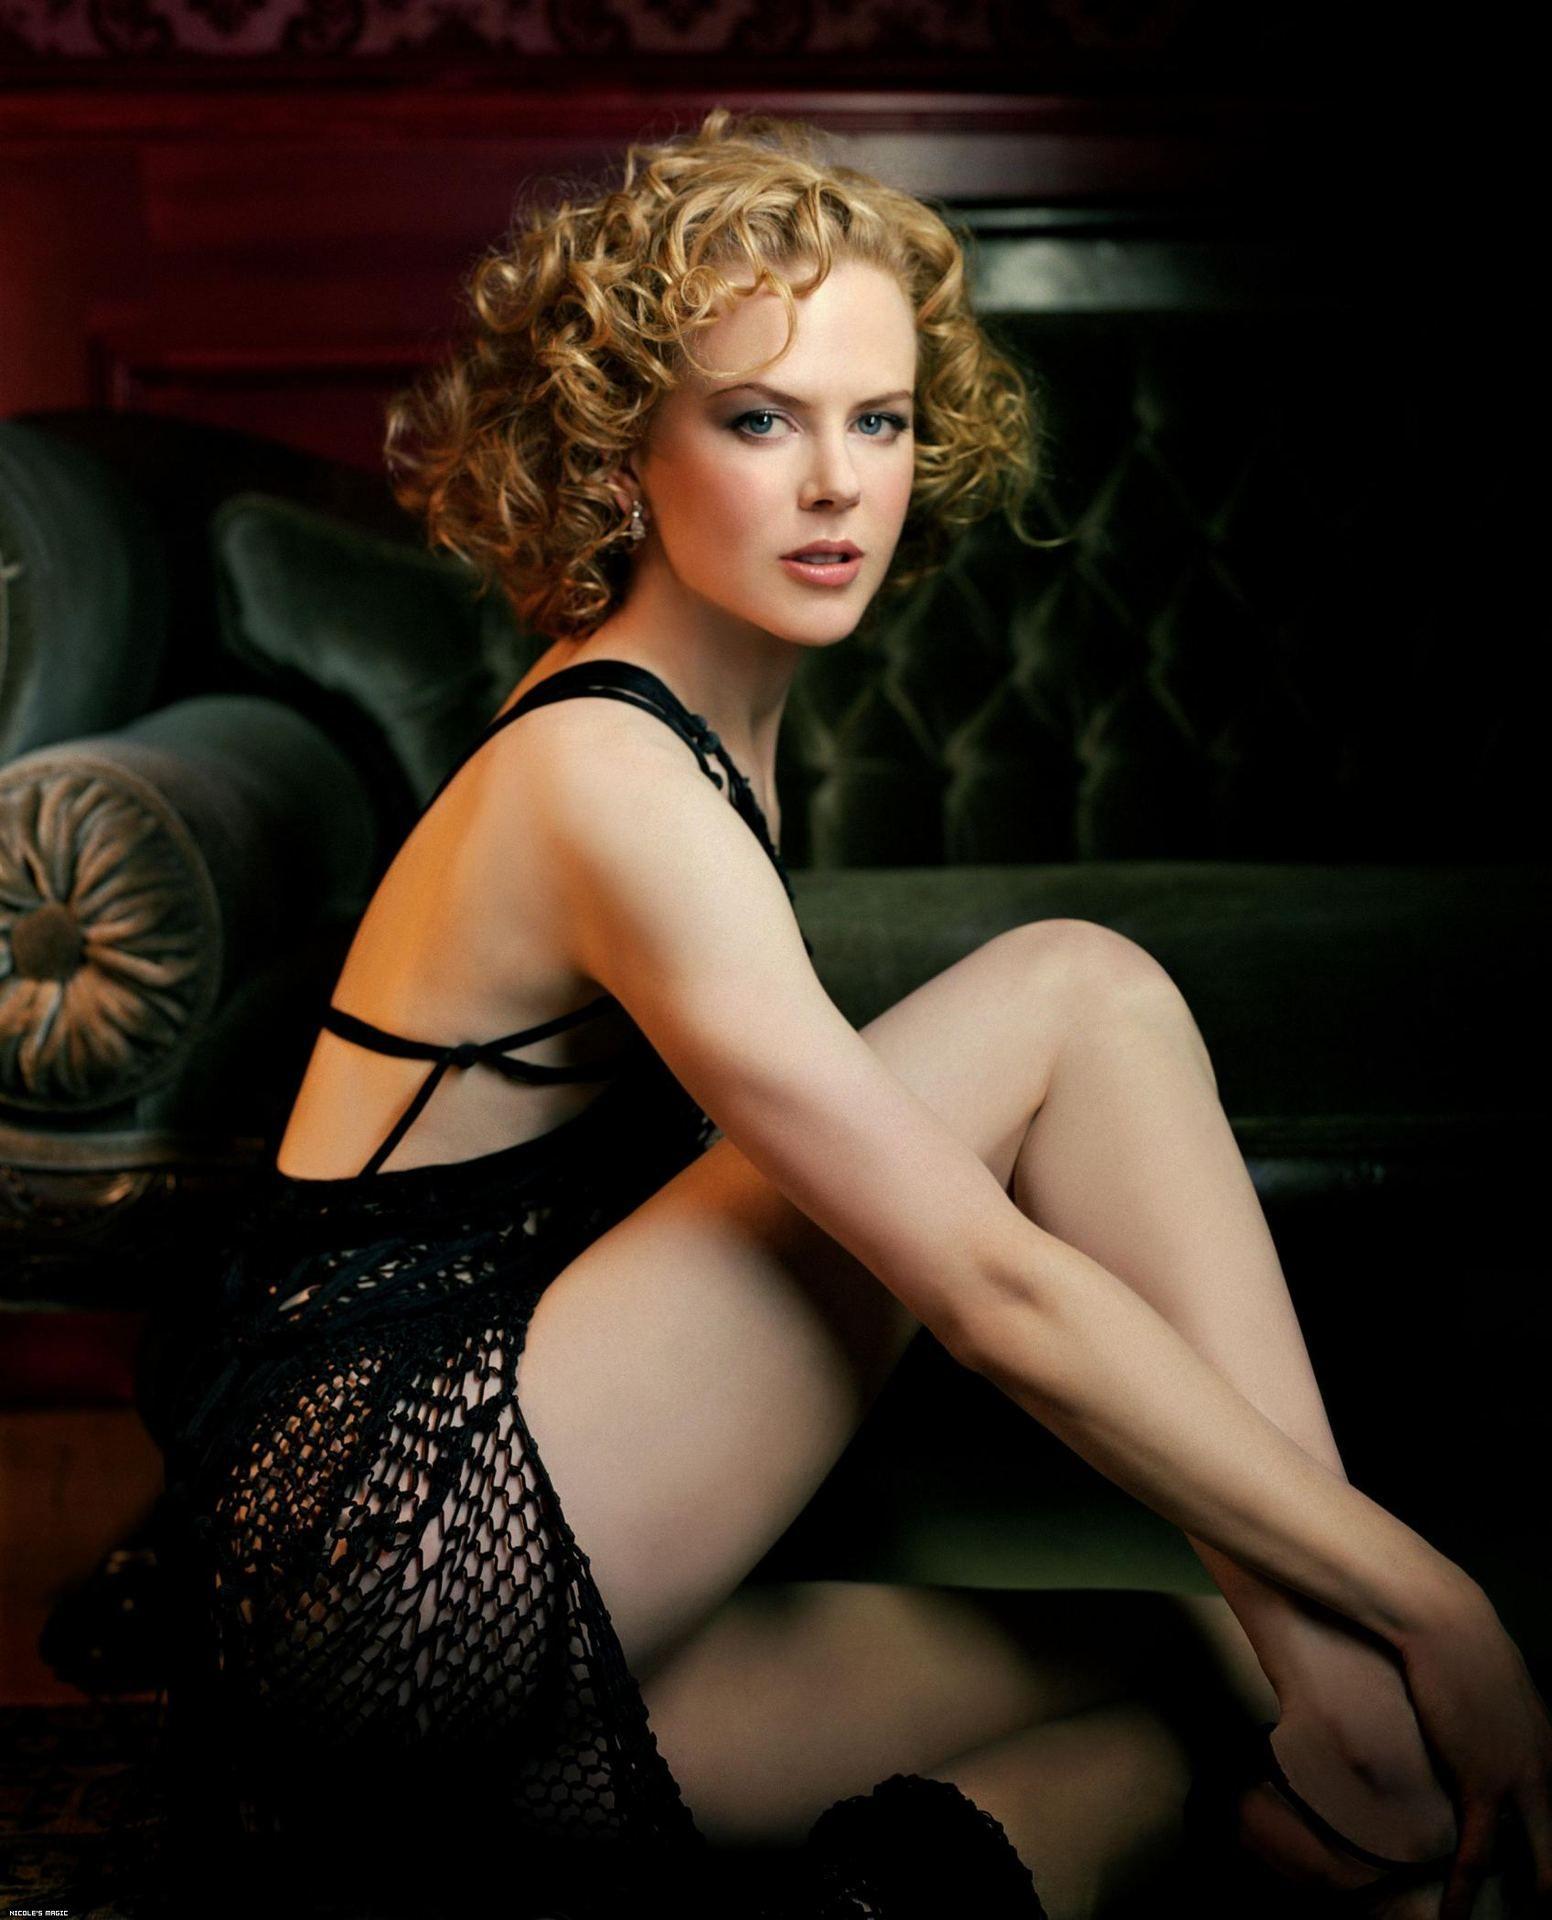 Erotica Nicole Kidman nude photos 2019